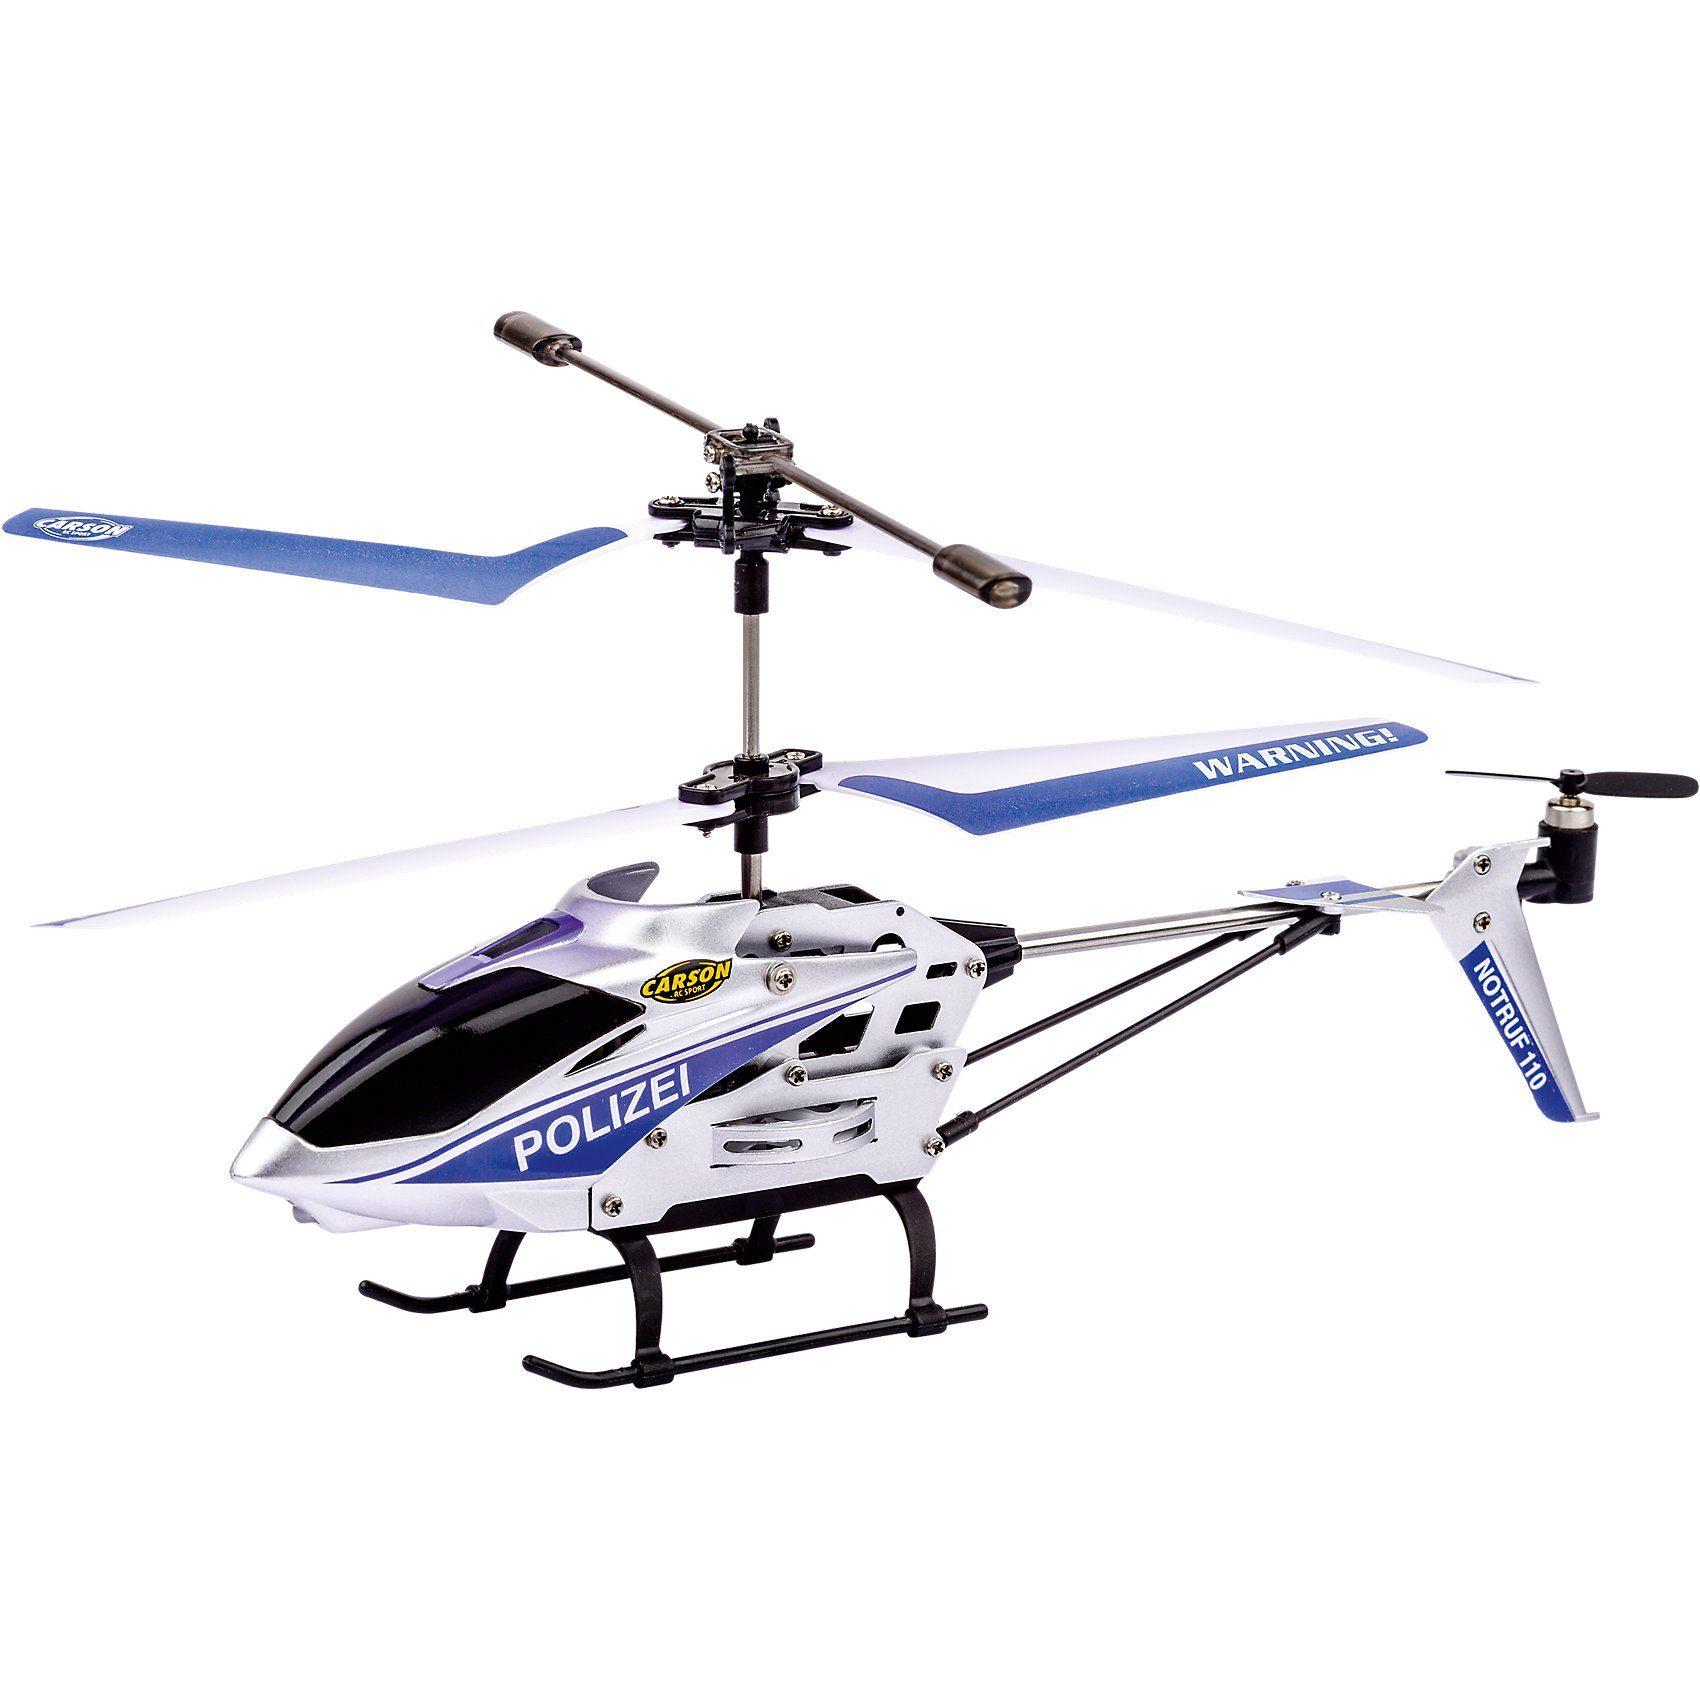 CARSON IR Helikopter Easy Tyrann Polizei